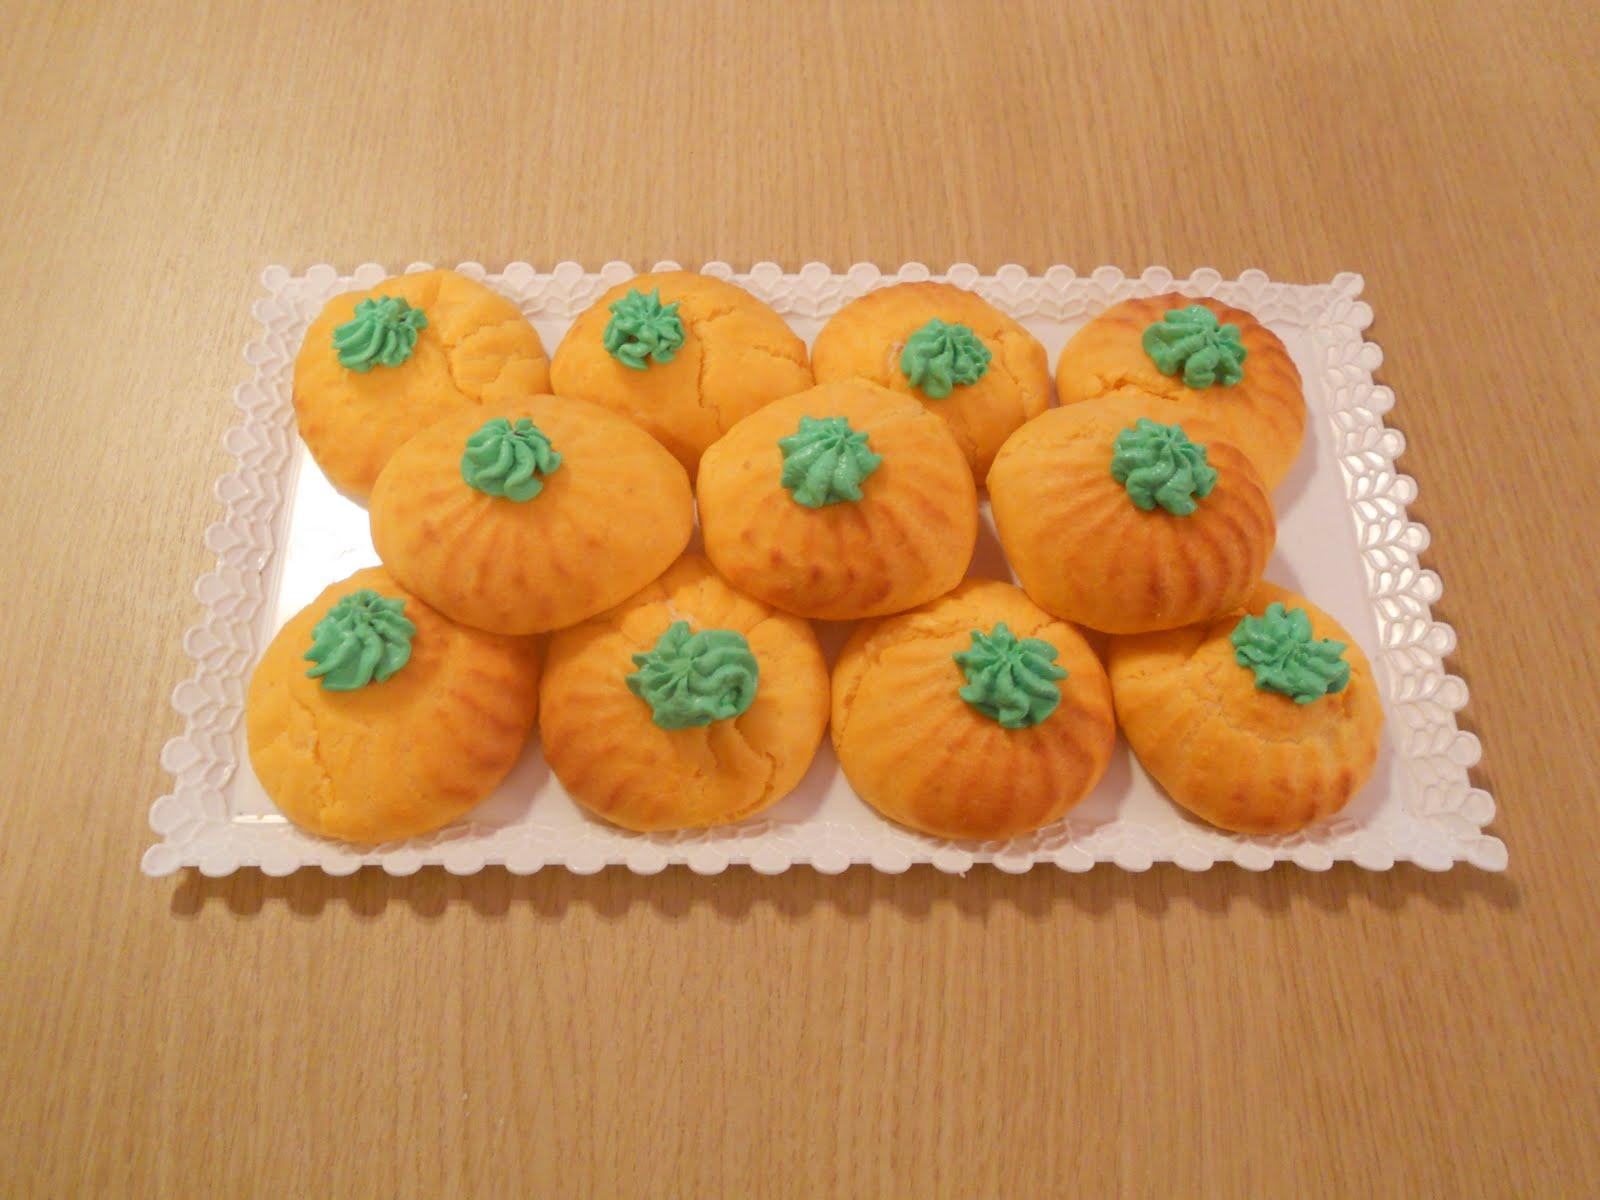 La cucina di Rosy: Zucche di Halloween